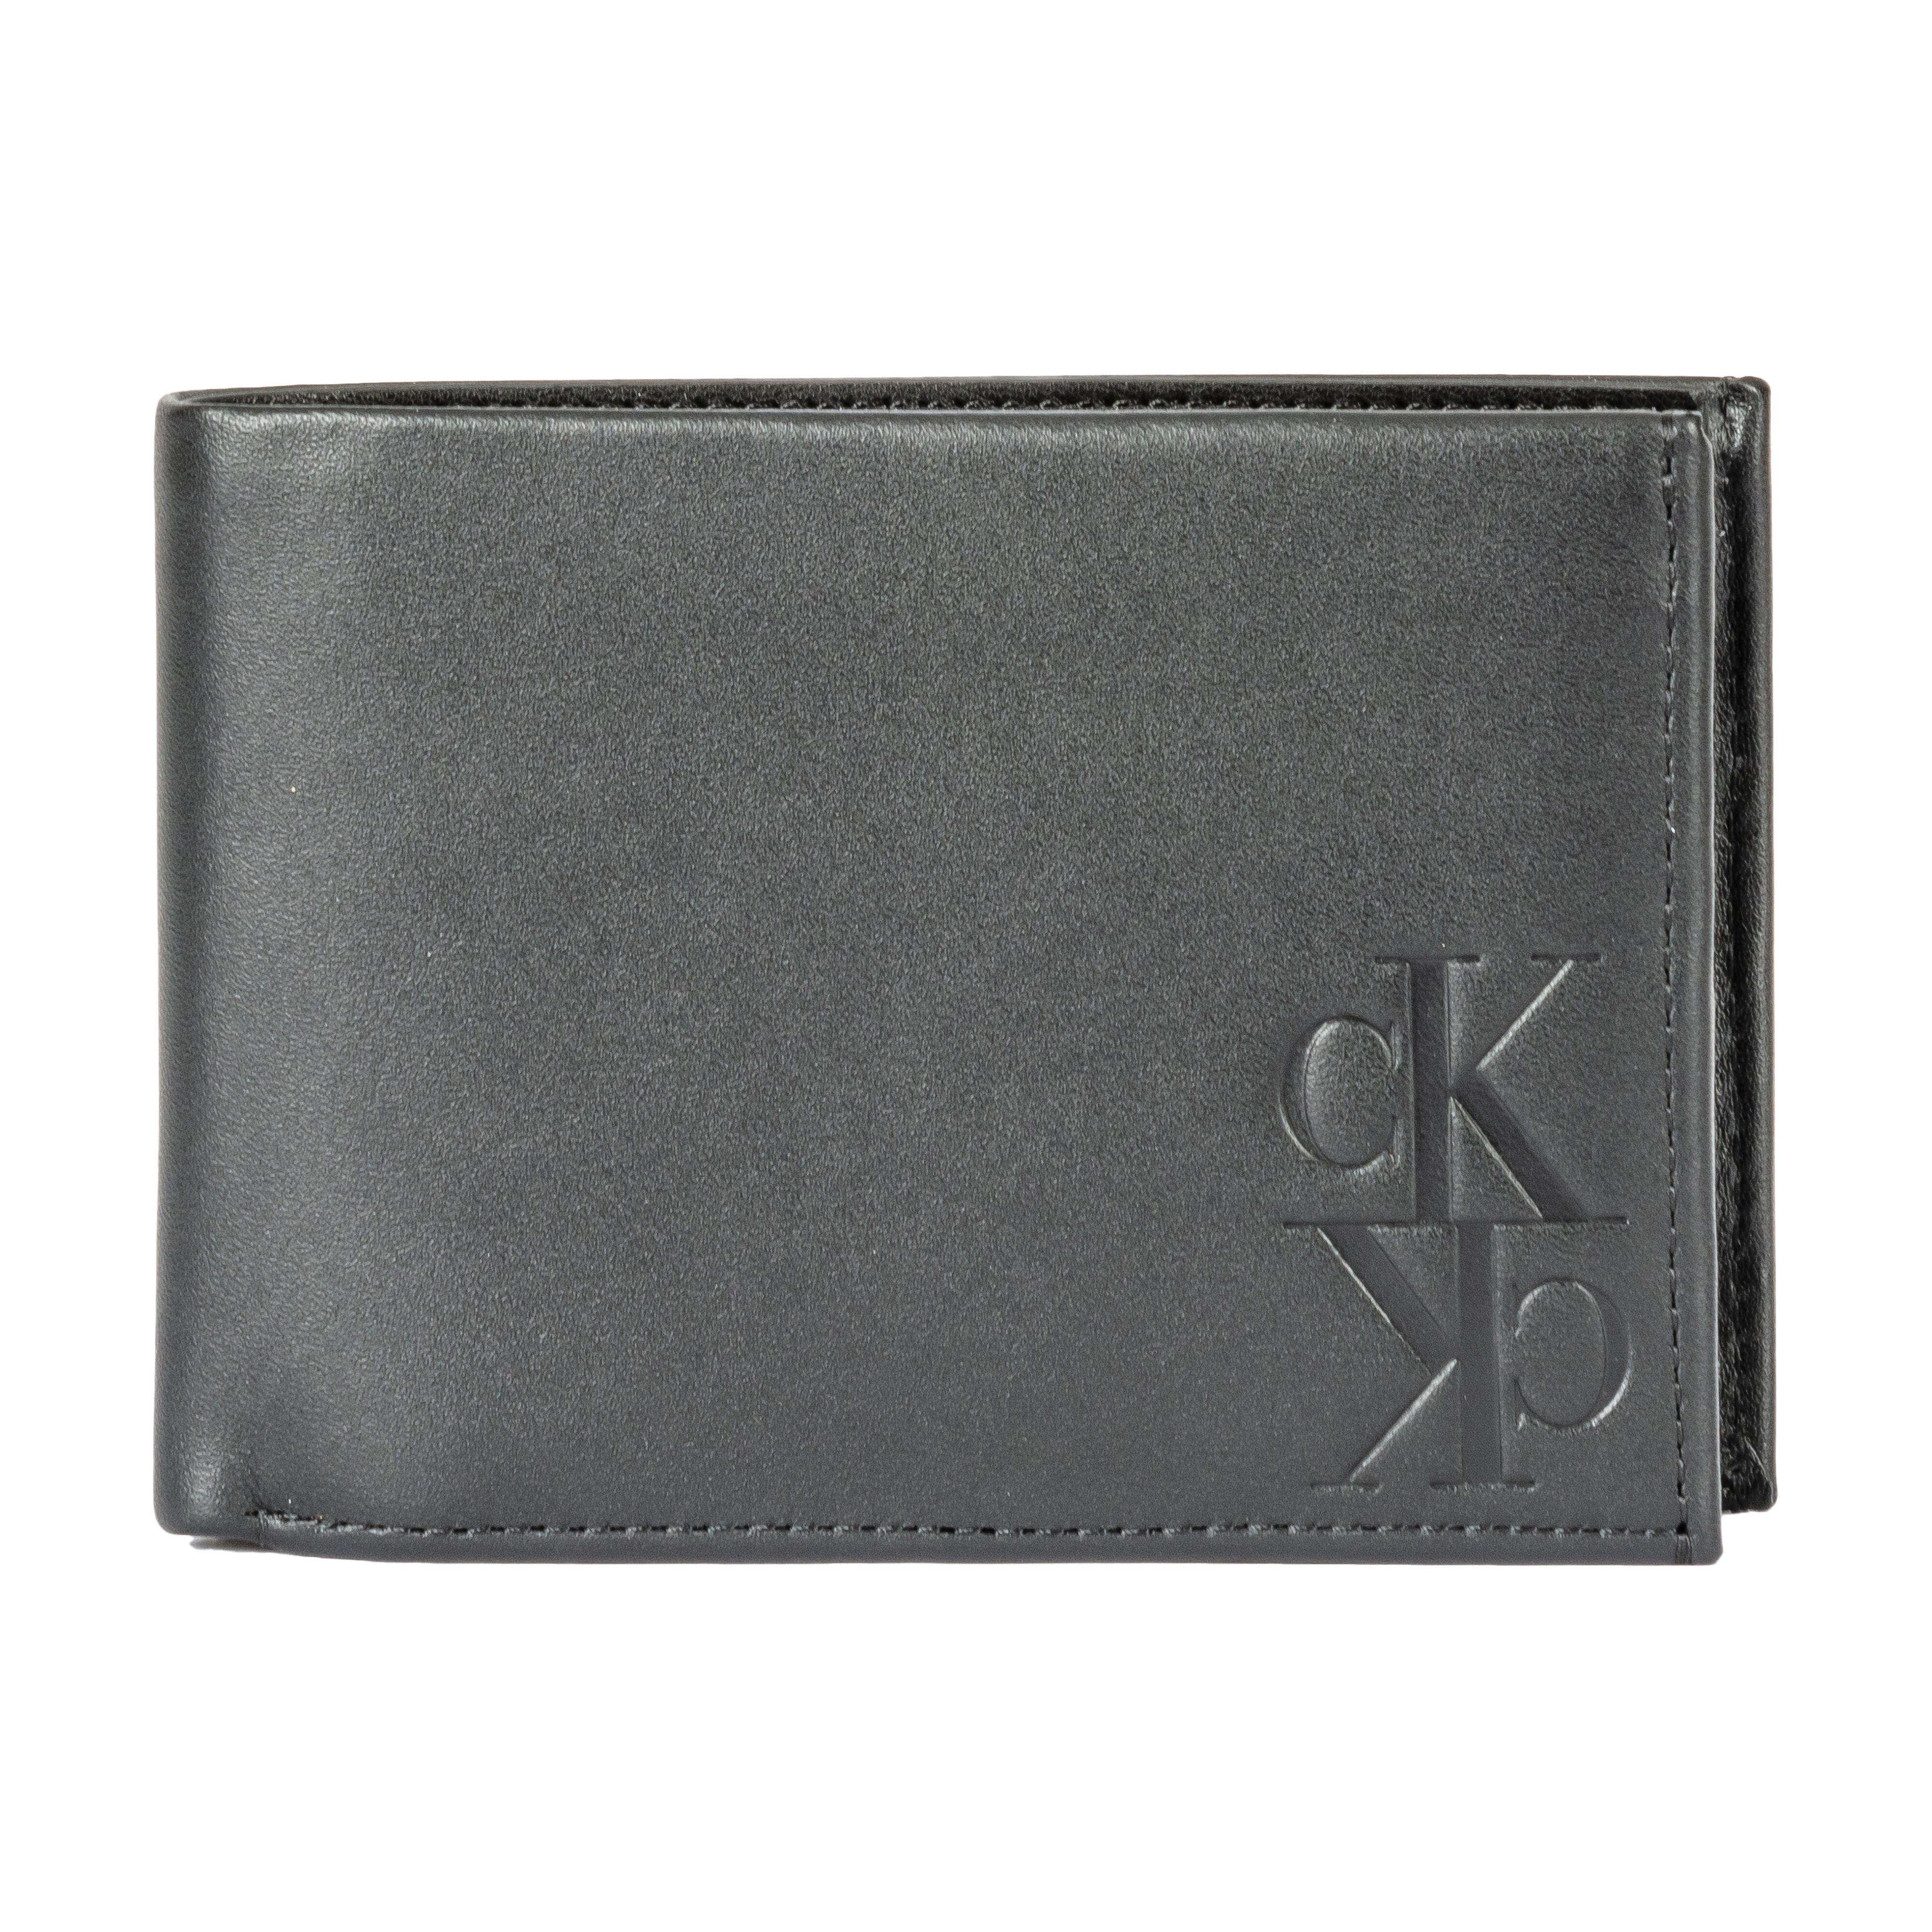 Calvin Klein Jeans Accessoires Portefeuille italien 3 volets Mirror Monogram Billfold Calvin Klein Jeans en cuir noir